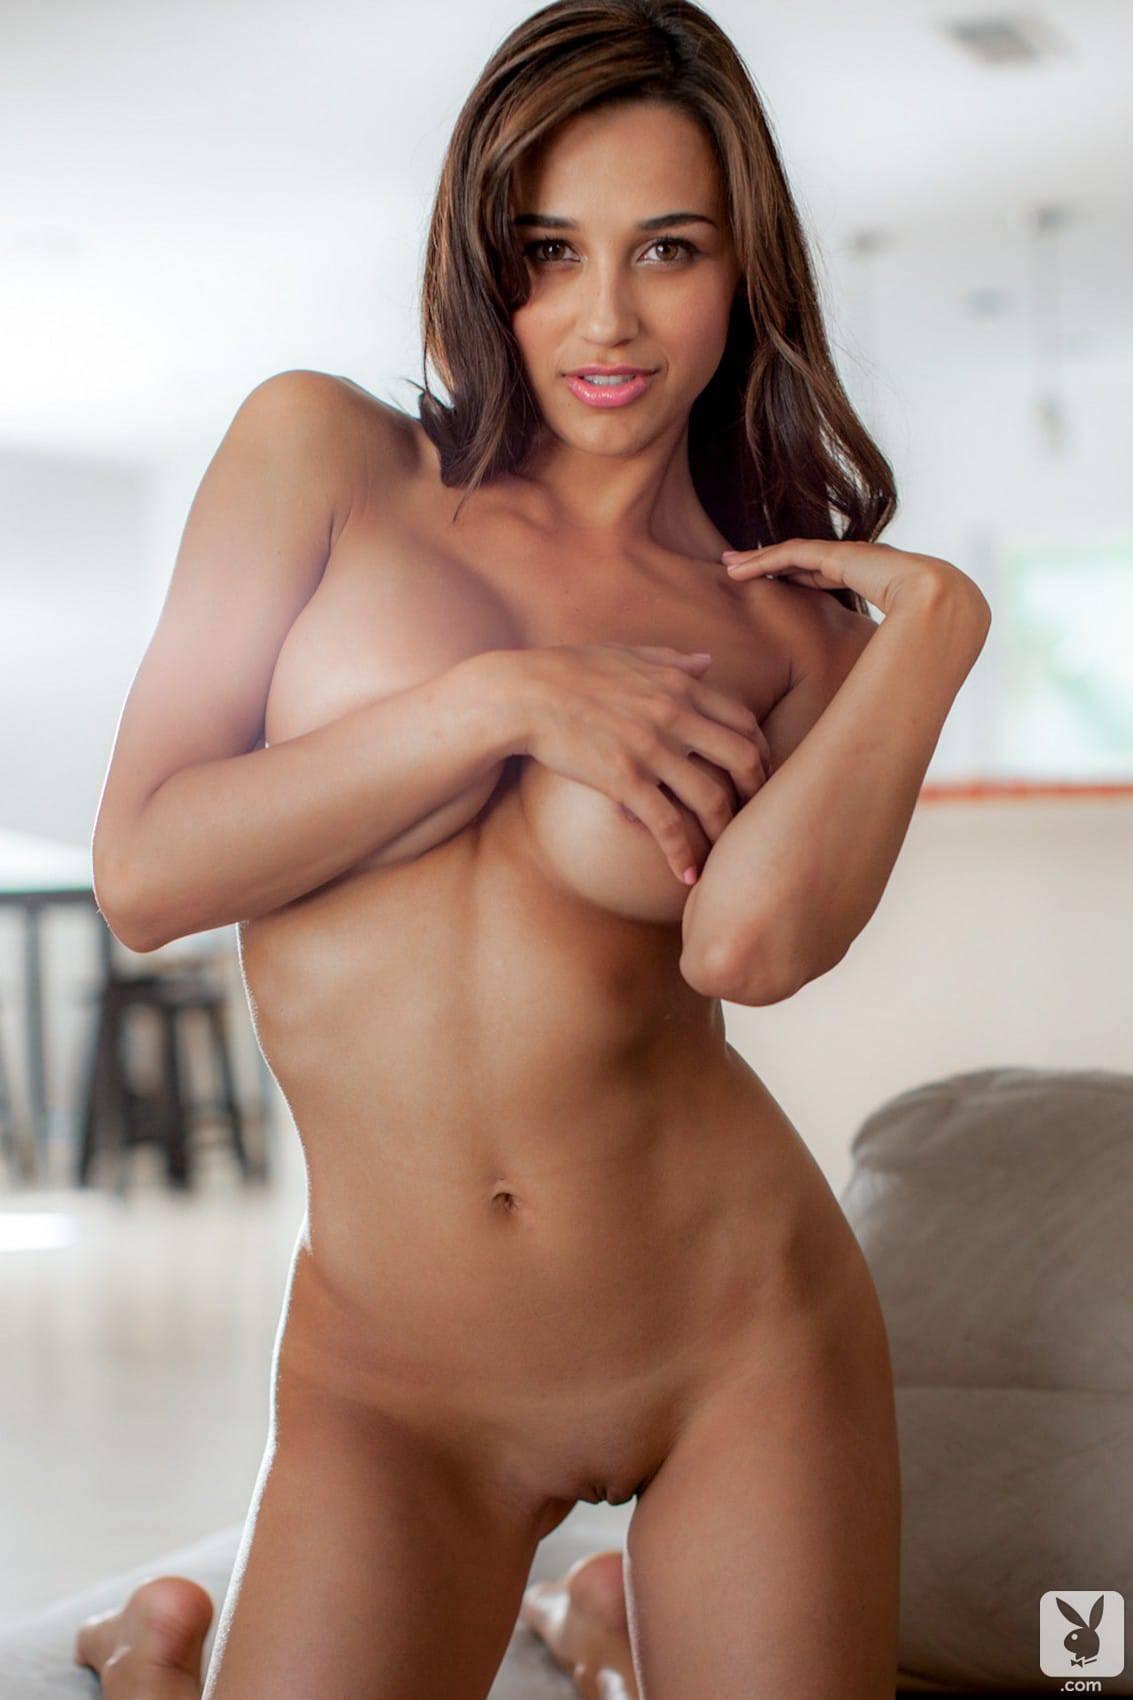 video porno gros seins meilleur escort paris